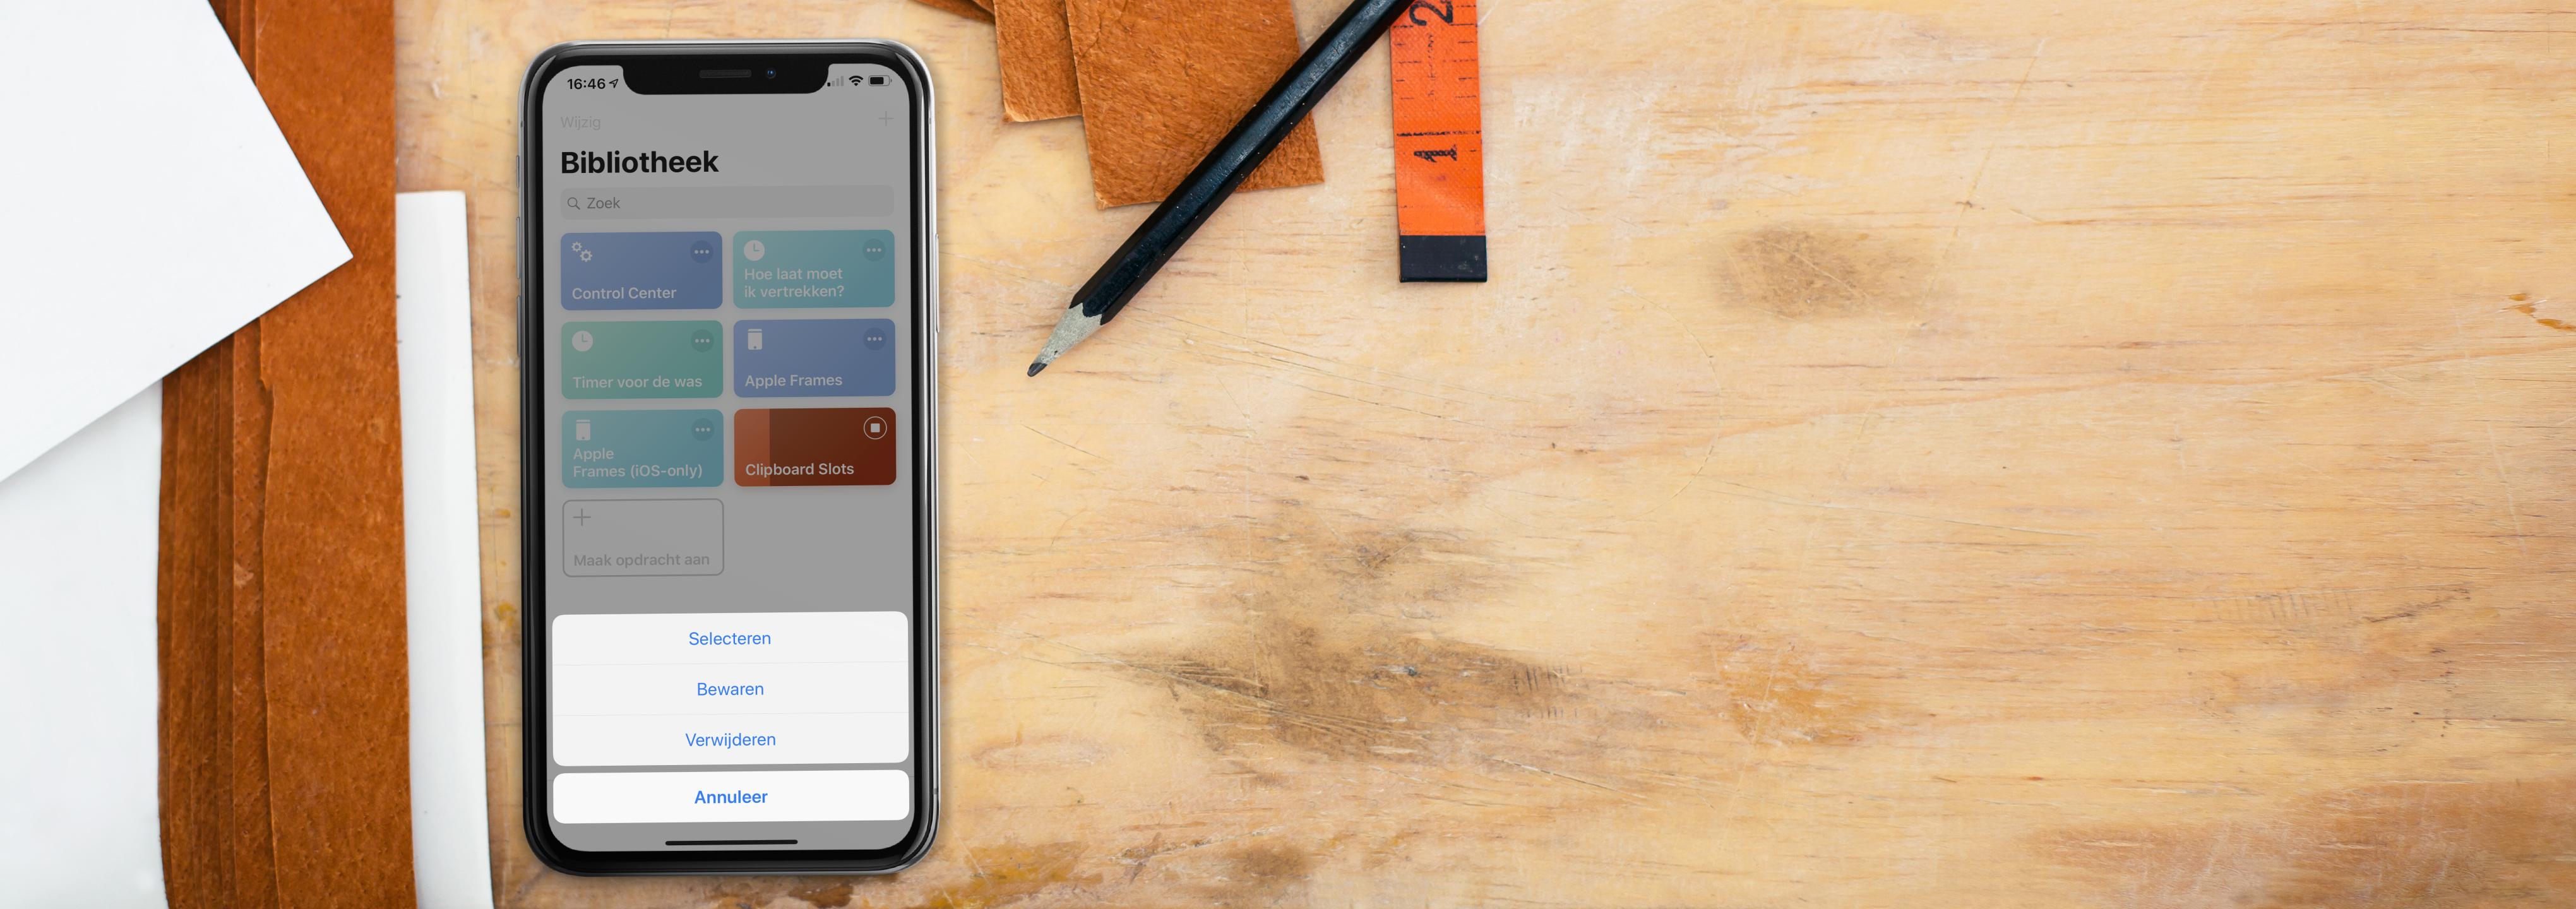 iPhone op bureau met Clipboard Siri Shortcut als screenshot.